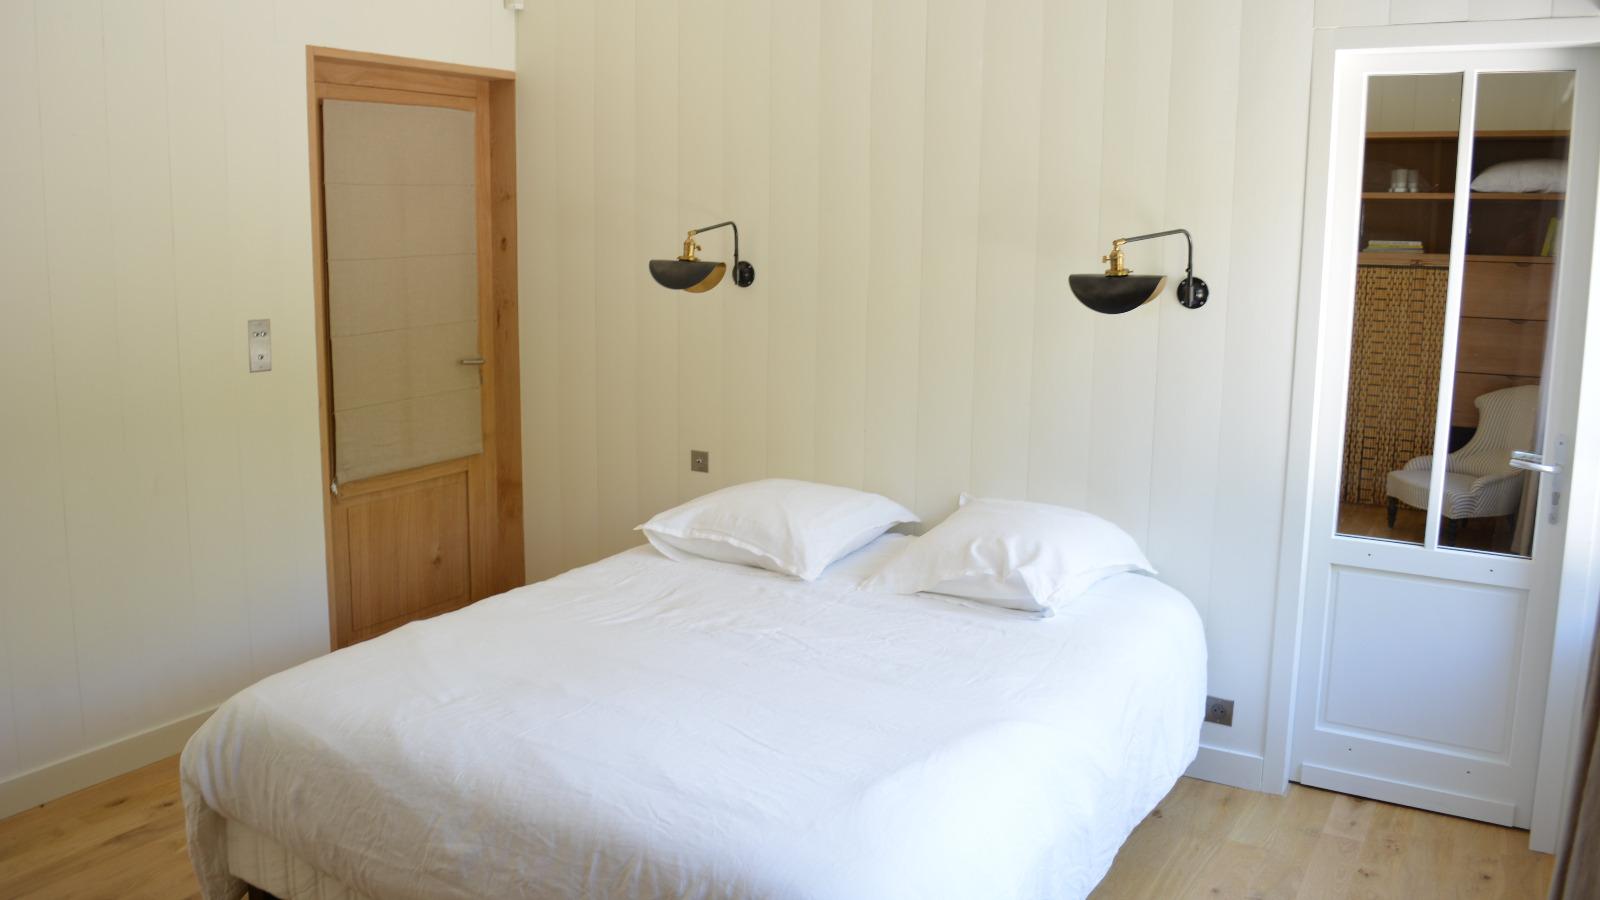 Cap ferret 44 hectares cabane de luxe en 1 re ligne du bassin acc s direct la plage immo - Hotel luxe cap ferret ...